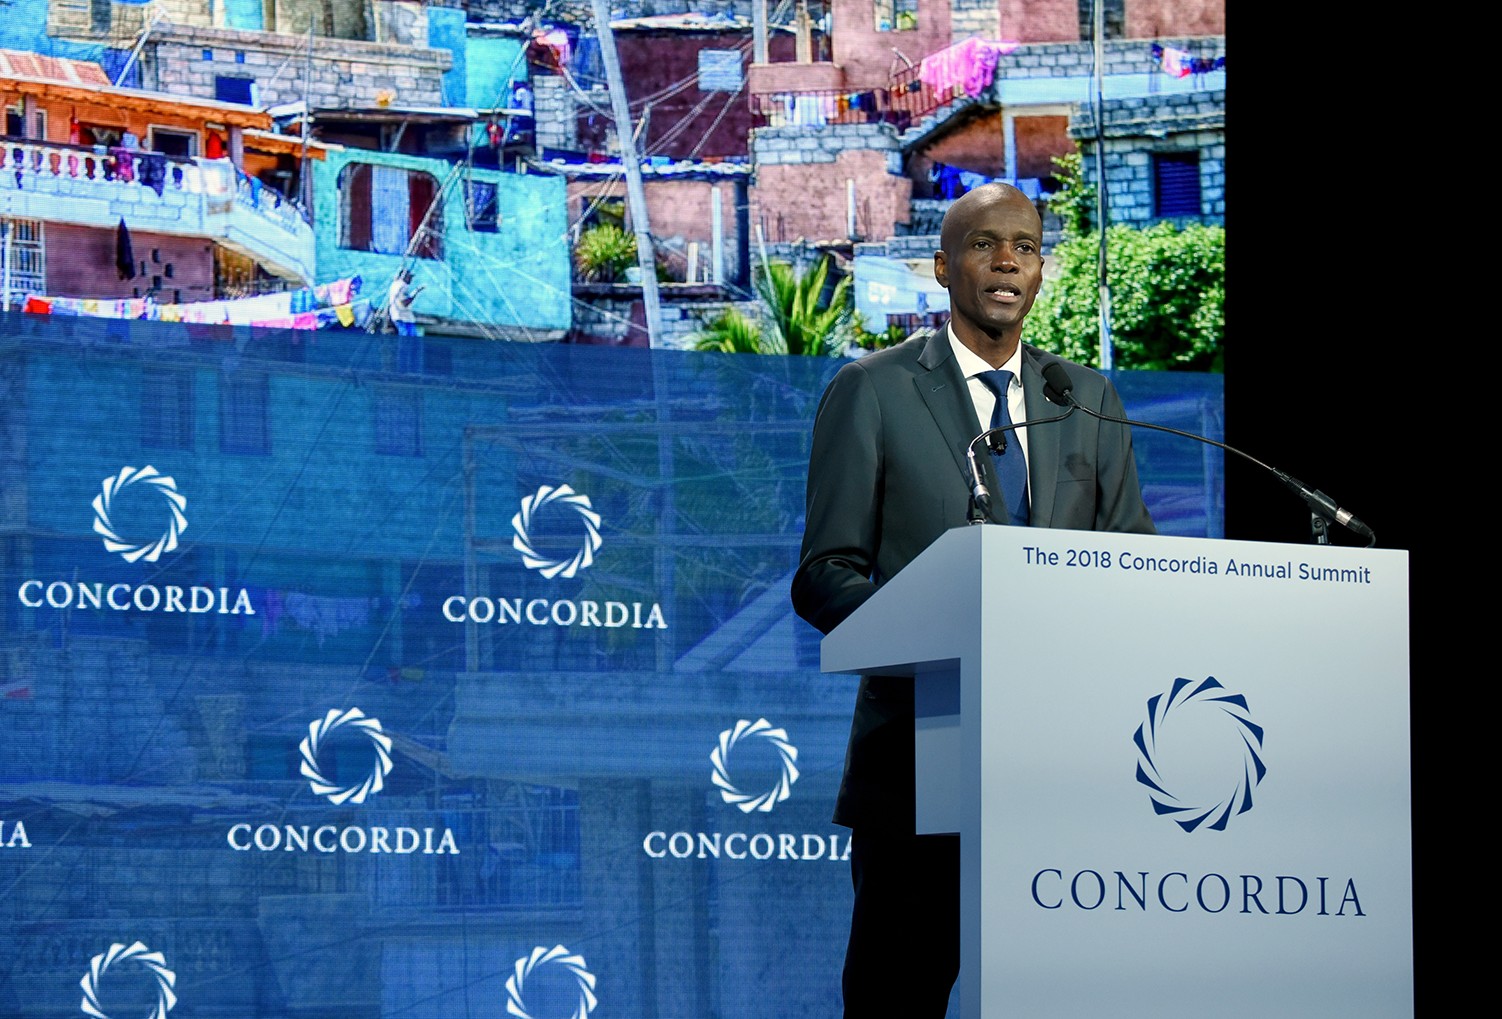 Jovenel Moi%CC%88se - Concordia shocked & saddened to learn of assassination of Jovenel Moïse, President of Haiti and 2018 Annual Summit Speaker